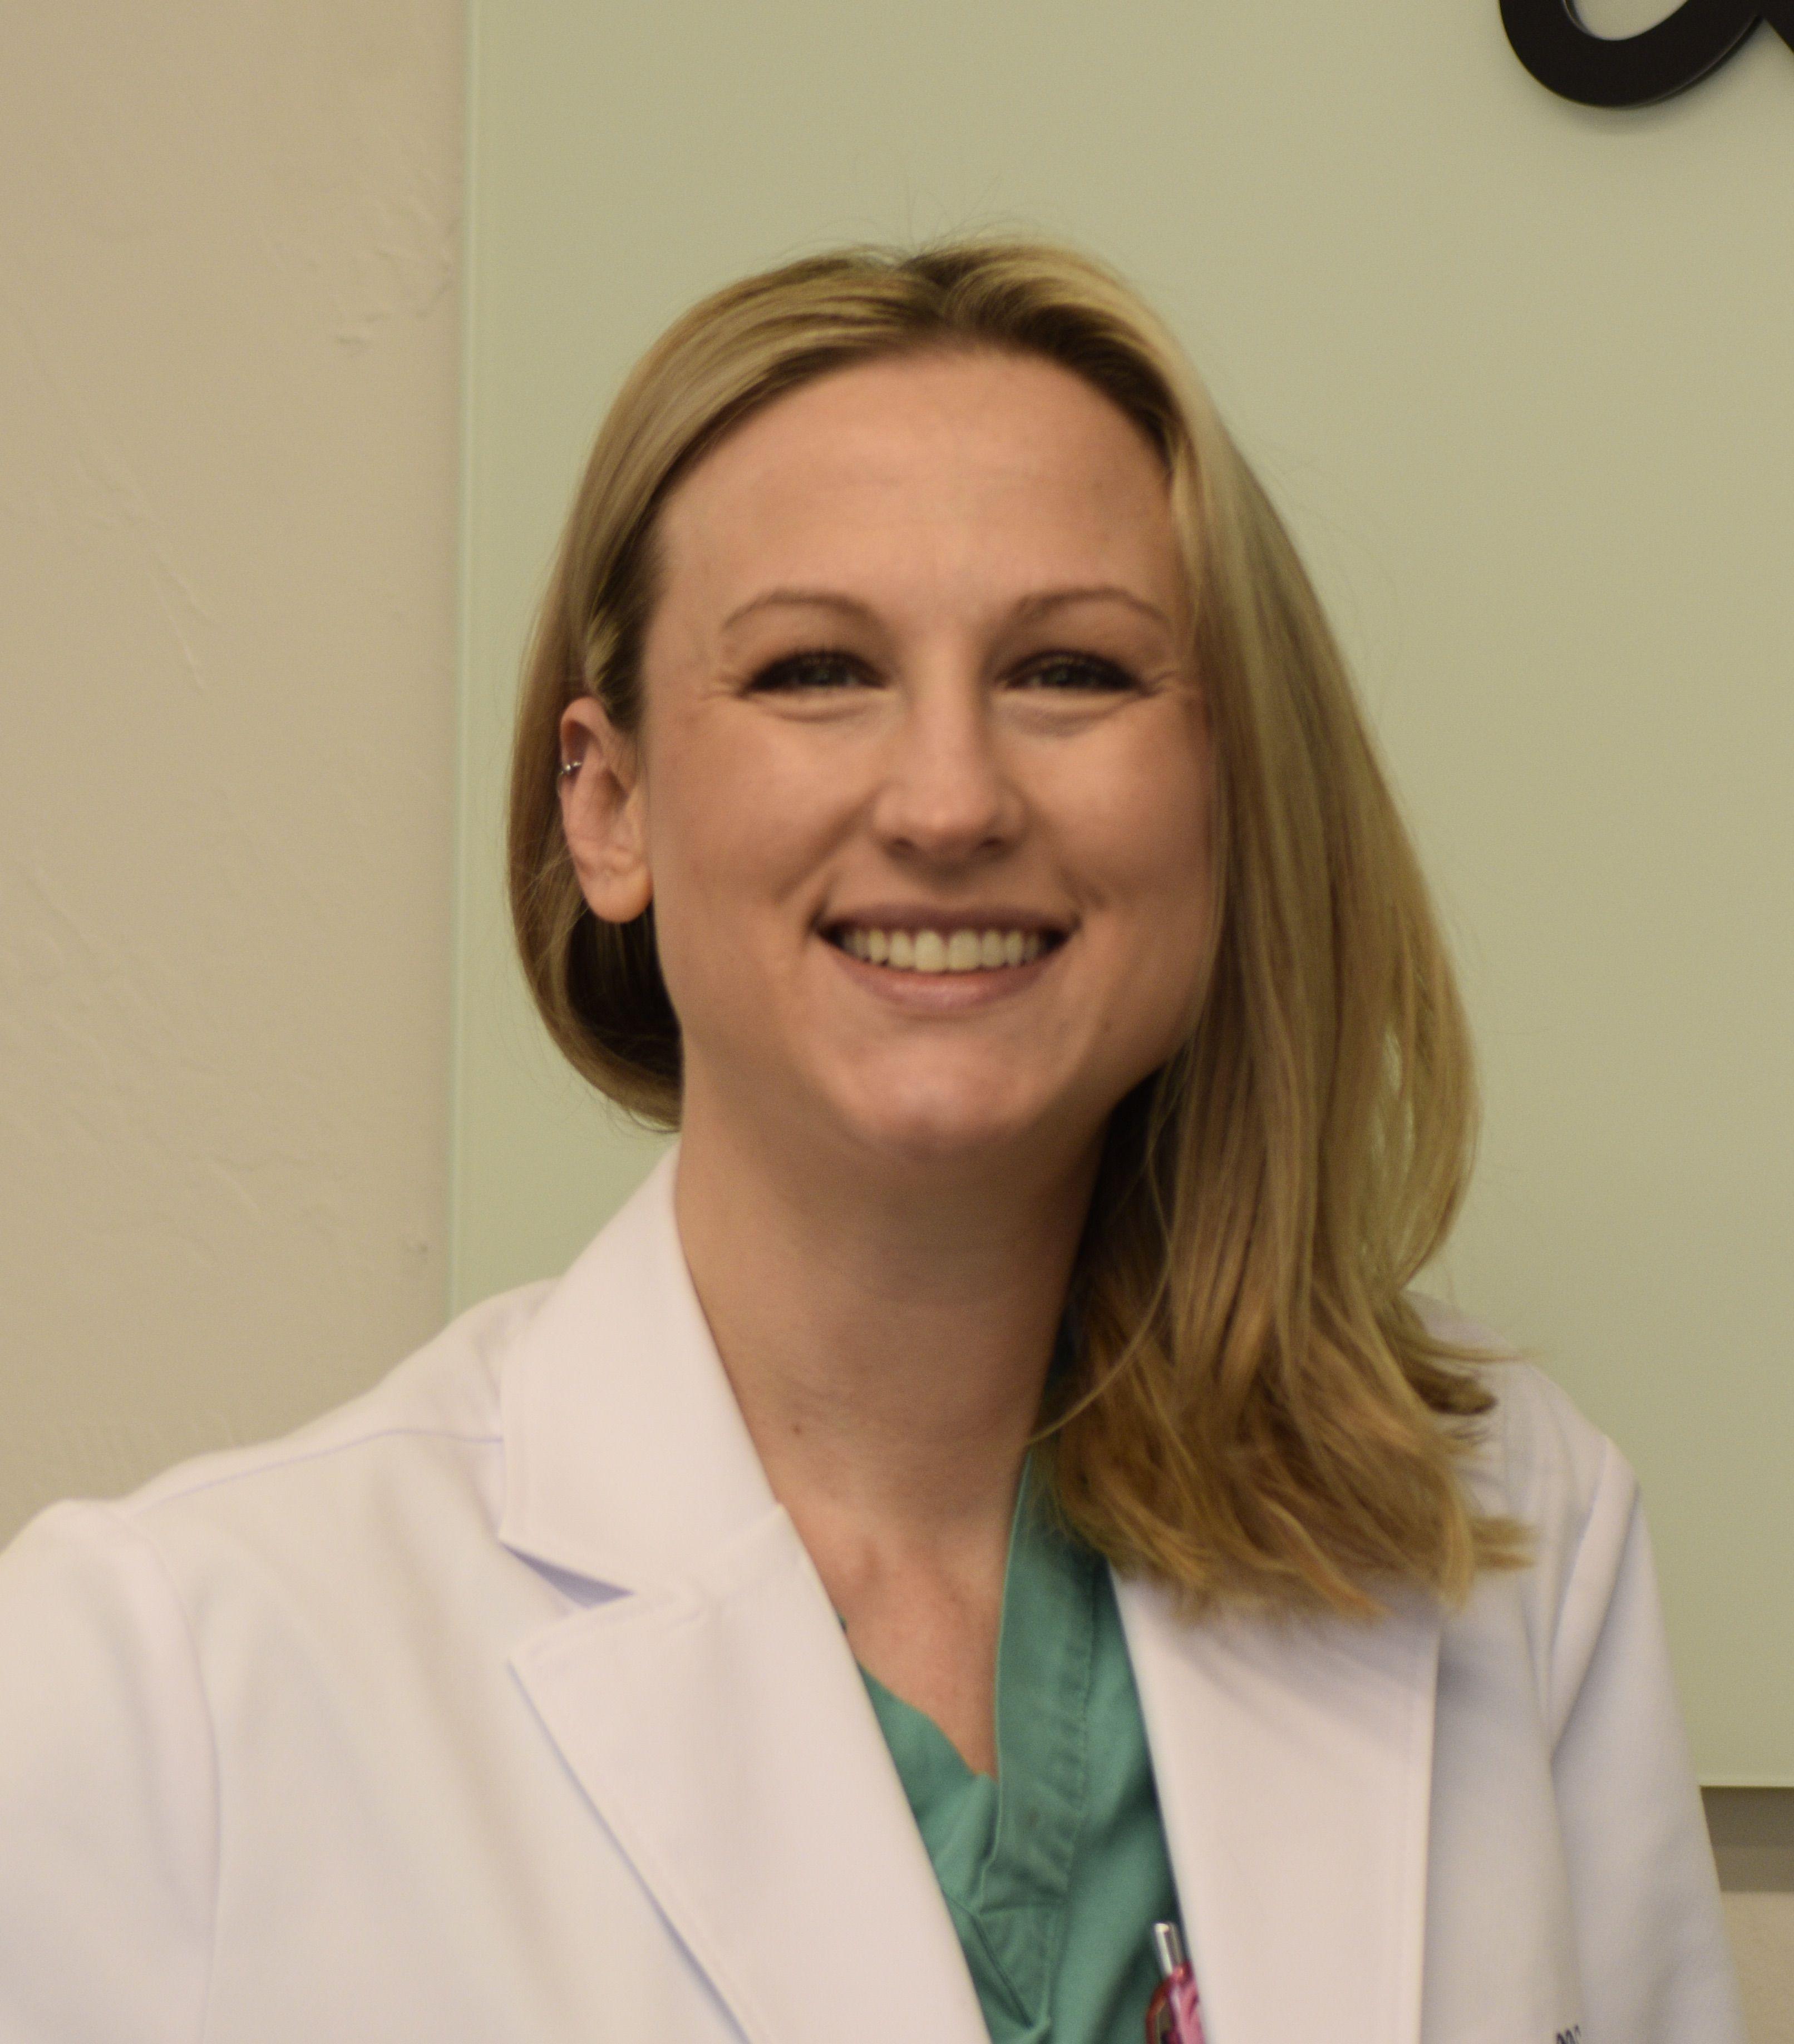 Dr. Kari Blankenship Dallas, TX